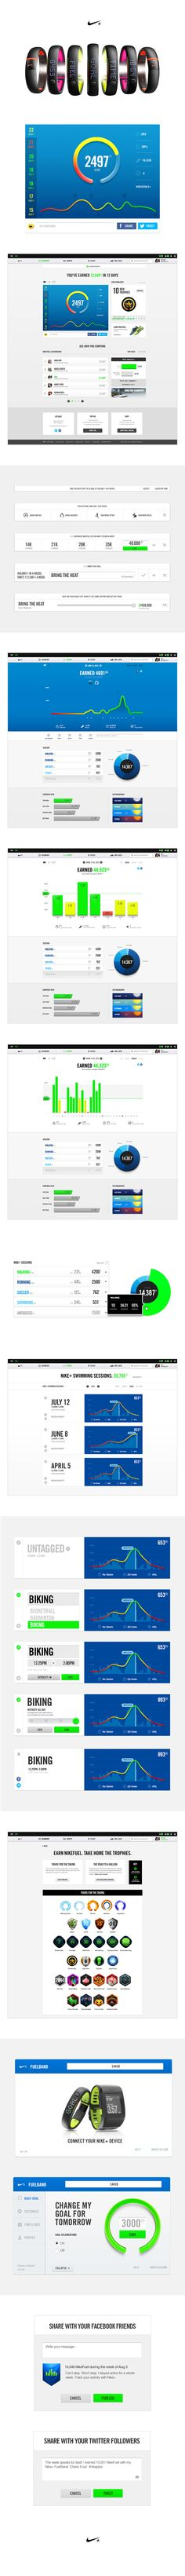 Nike+ by John White, via Behance |  #marketingsportowy #marketingsportu